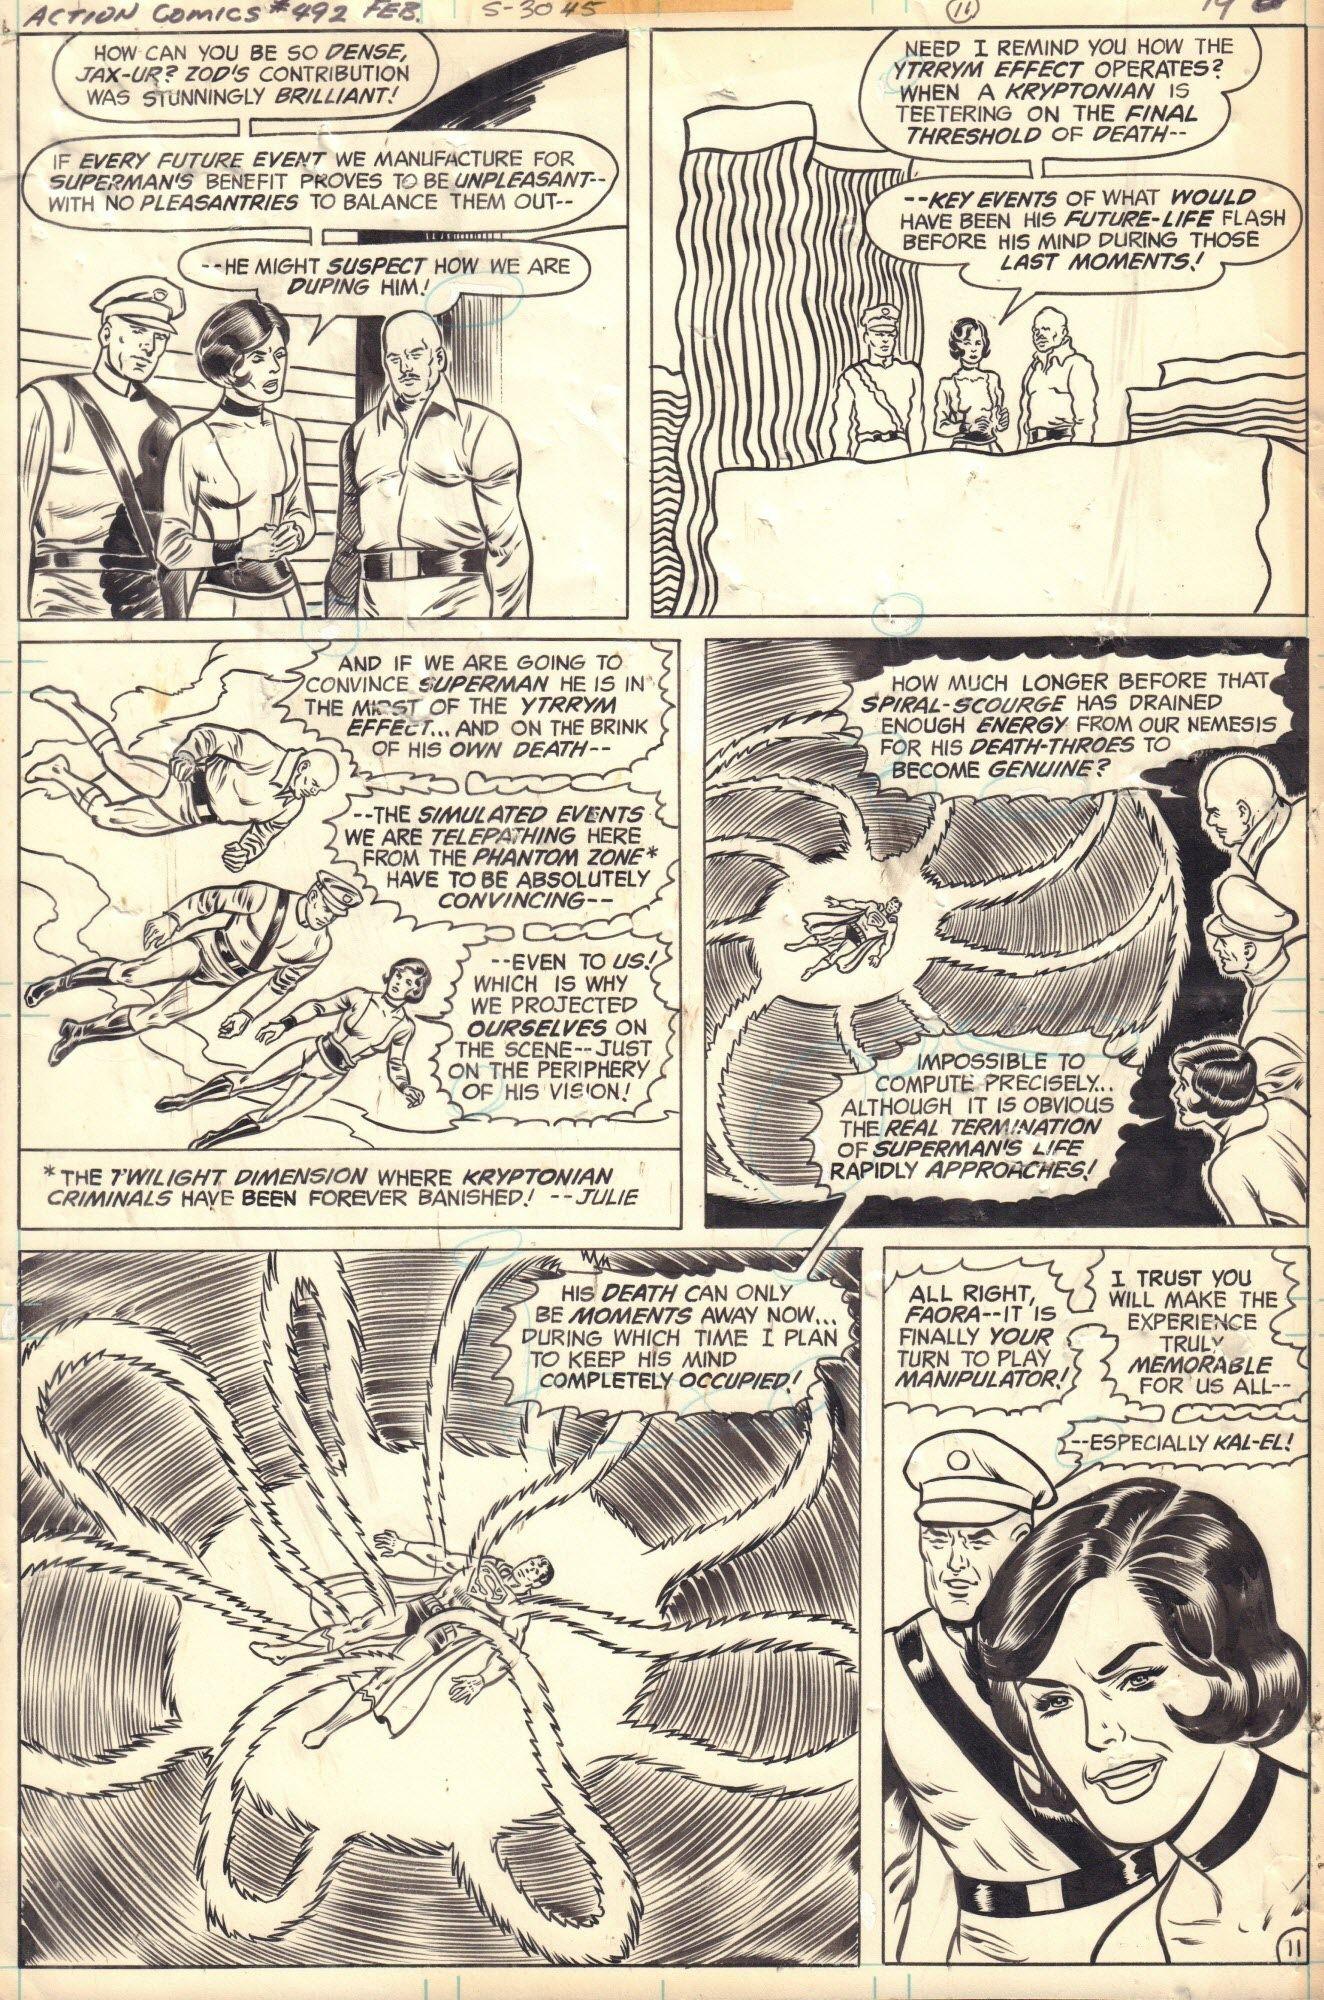 Action Comics #492 / 11